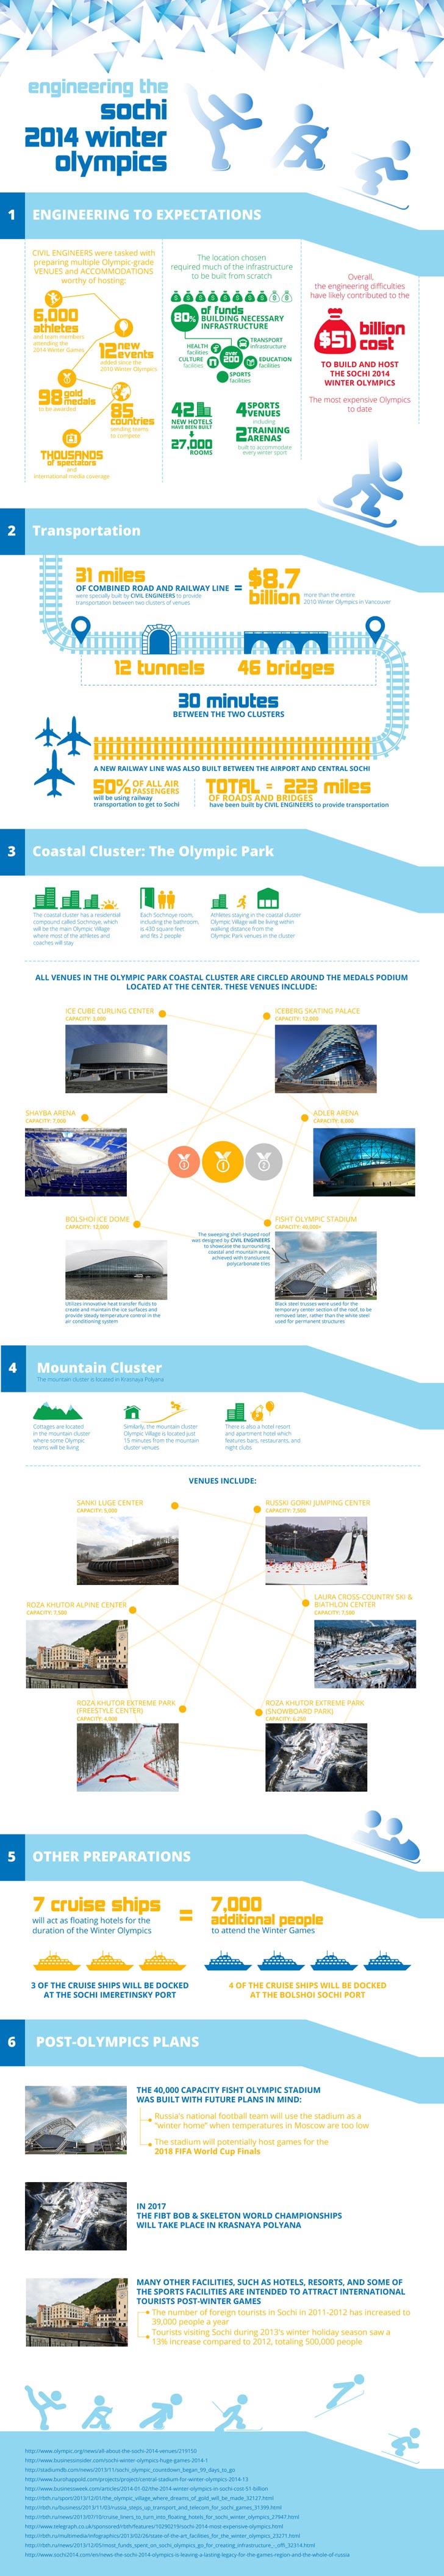 infographic sochi